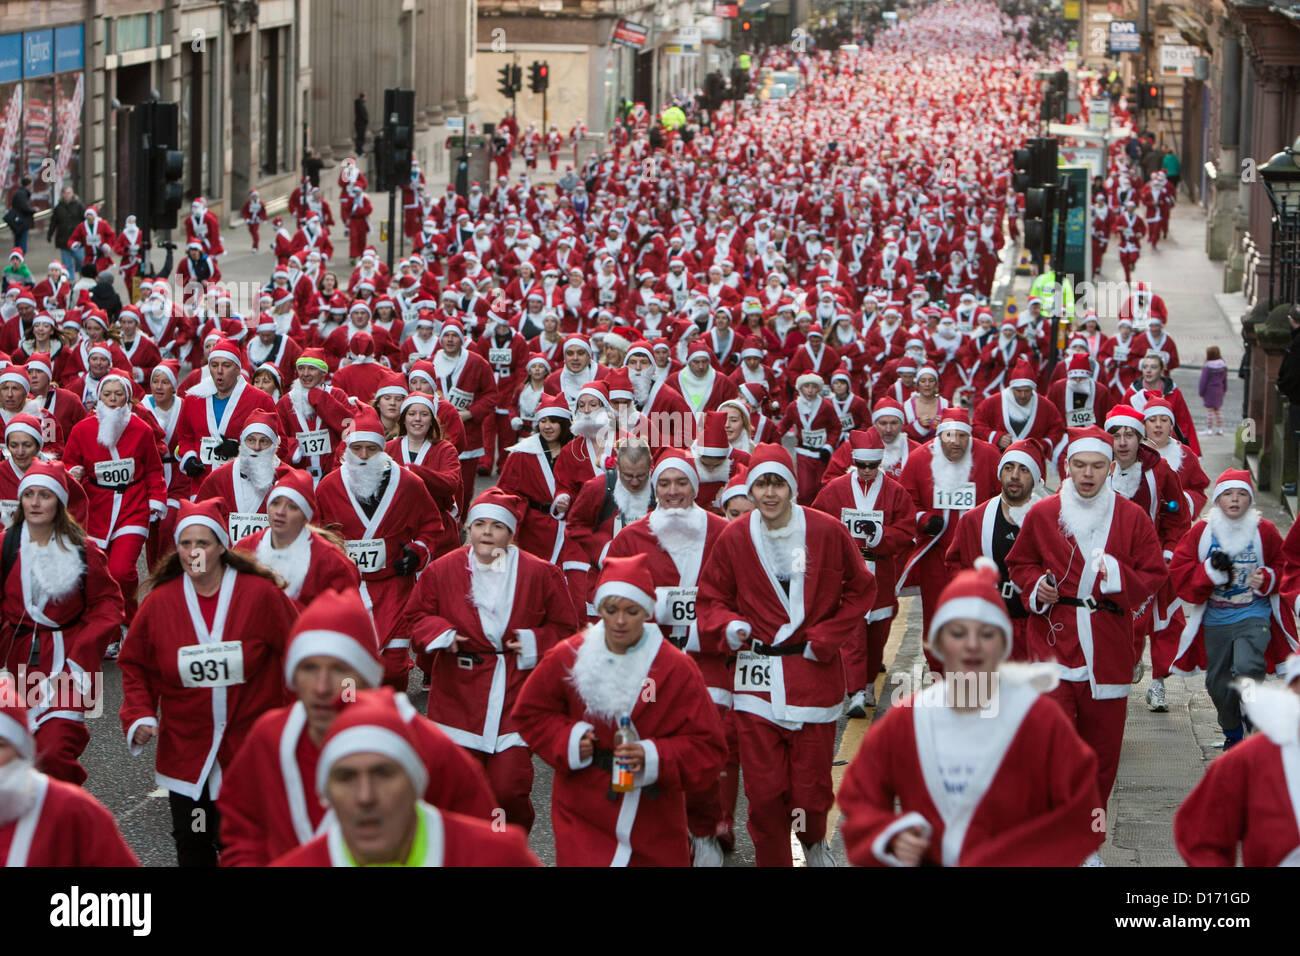 2,400 people undertake a 5km run dressed as Santa, in an annual run known as the Santa Dash, in Glasgow, Scotland, - Stock Image